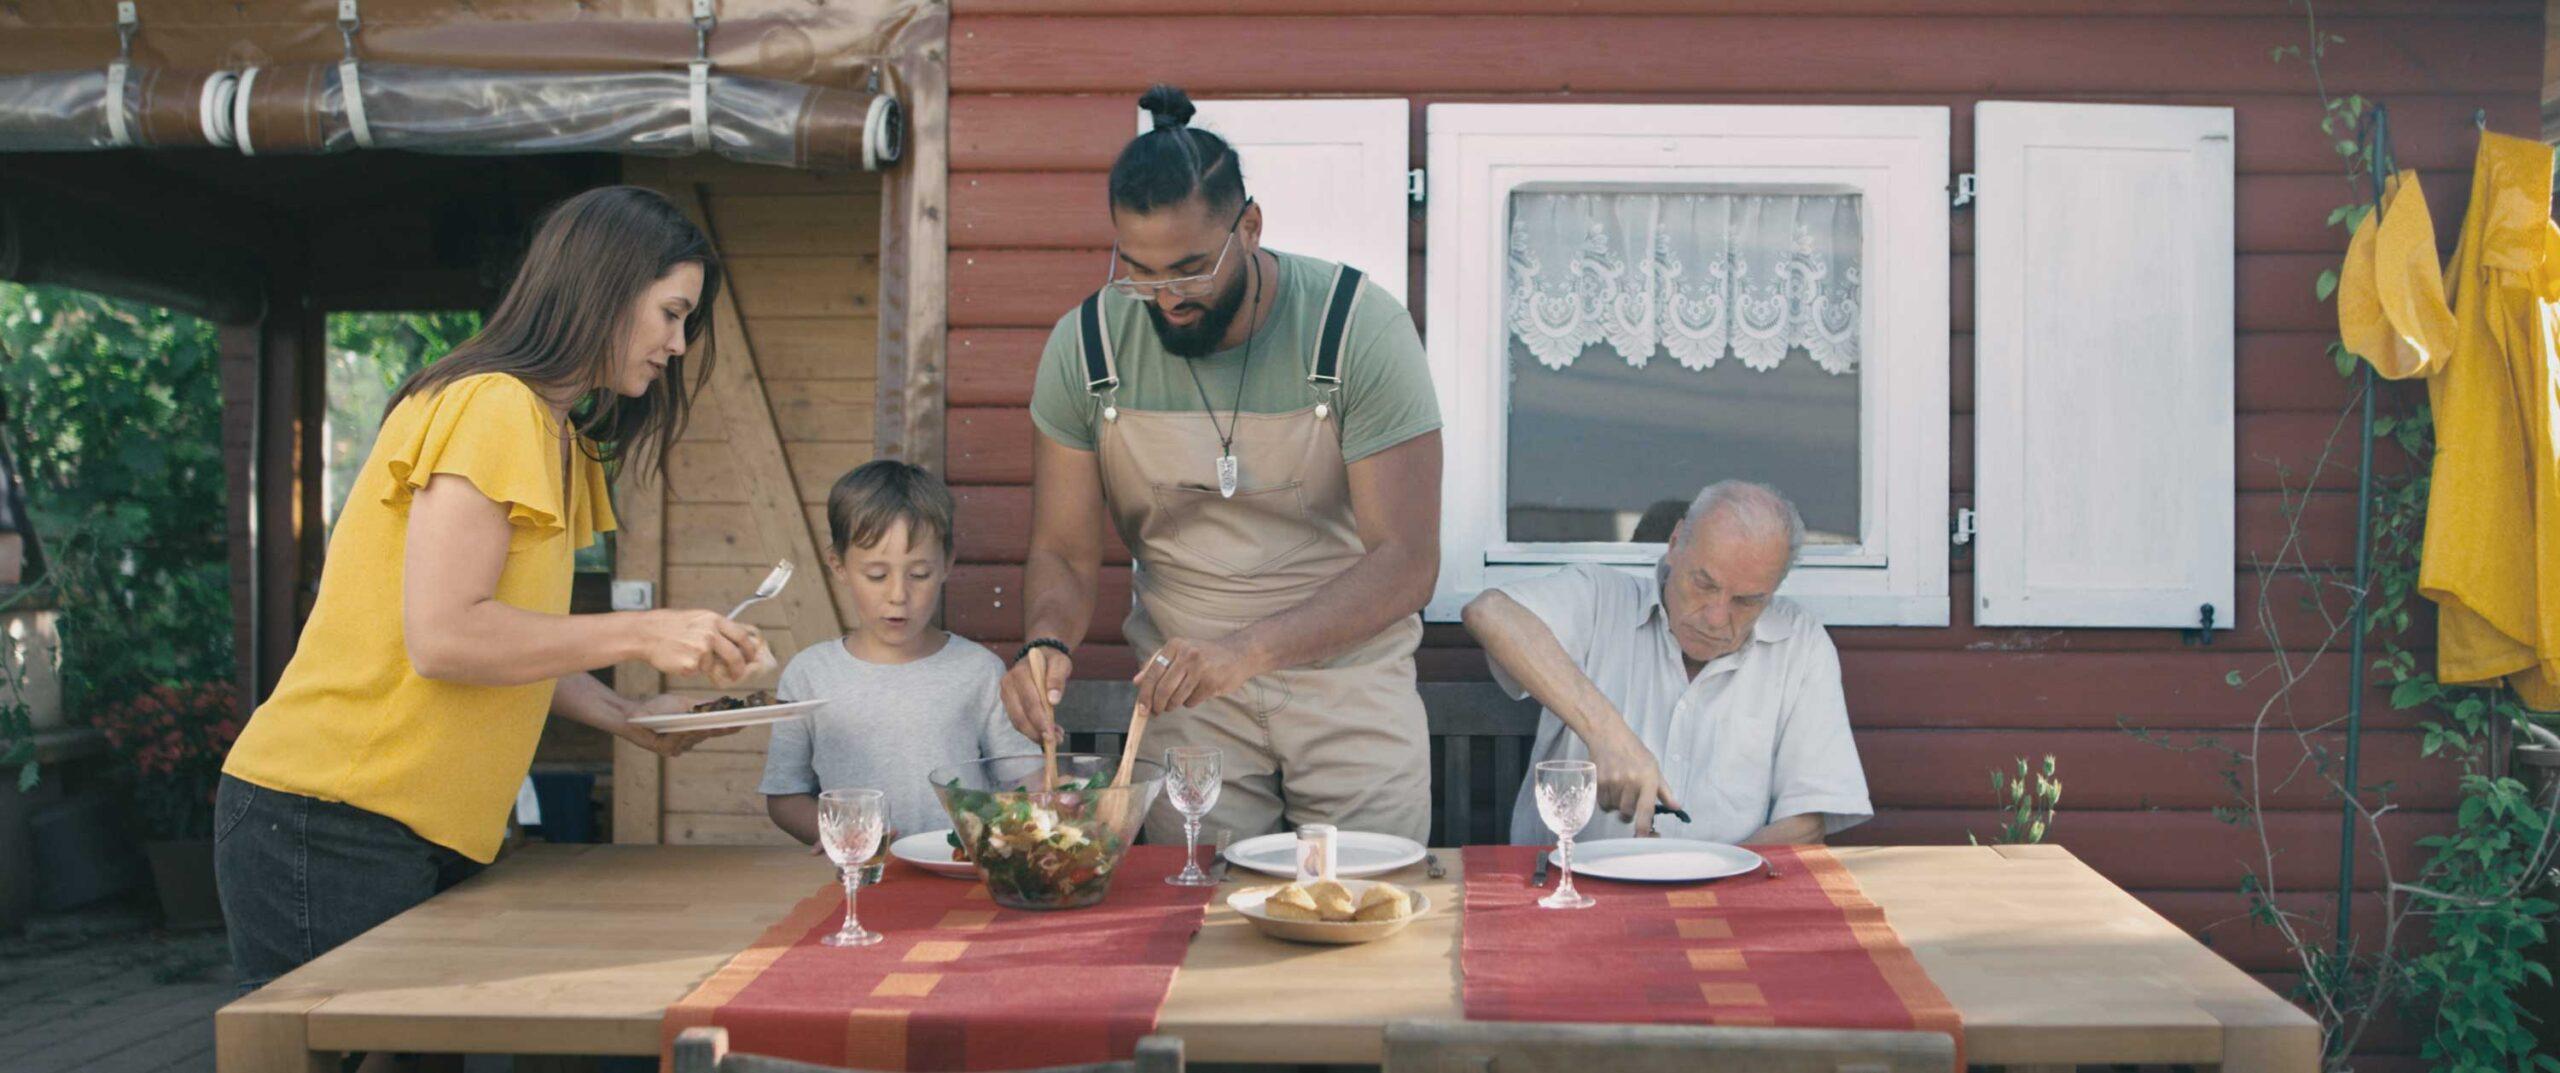 Pünt | garden community eating